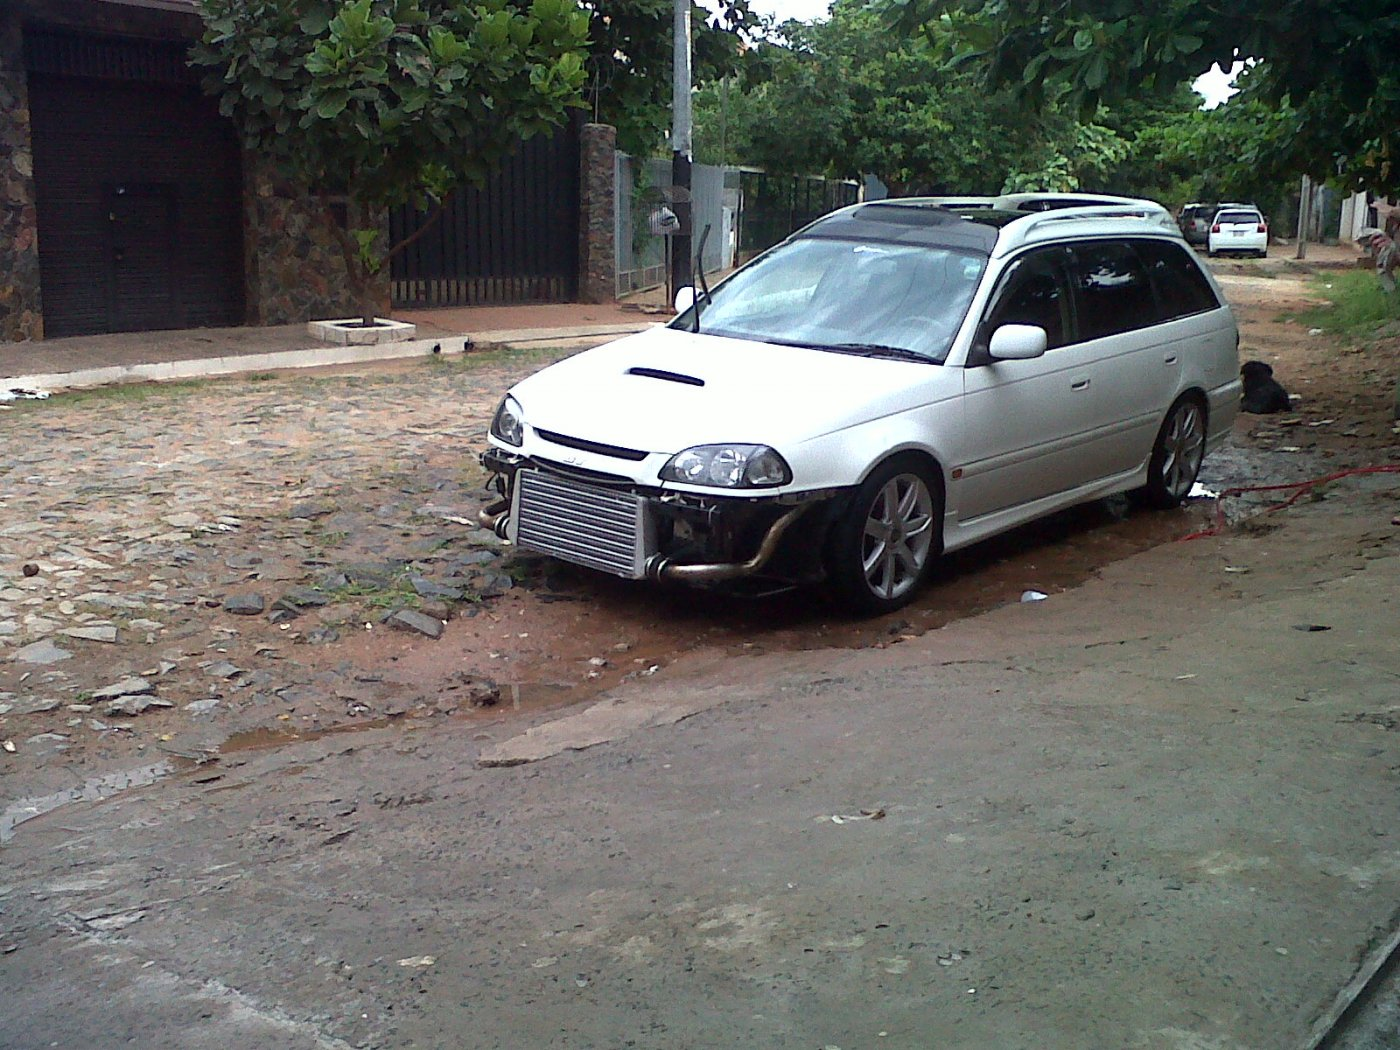 IMG00436-20121110-1659.jpg